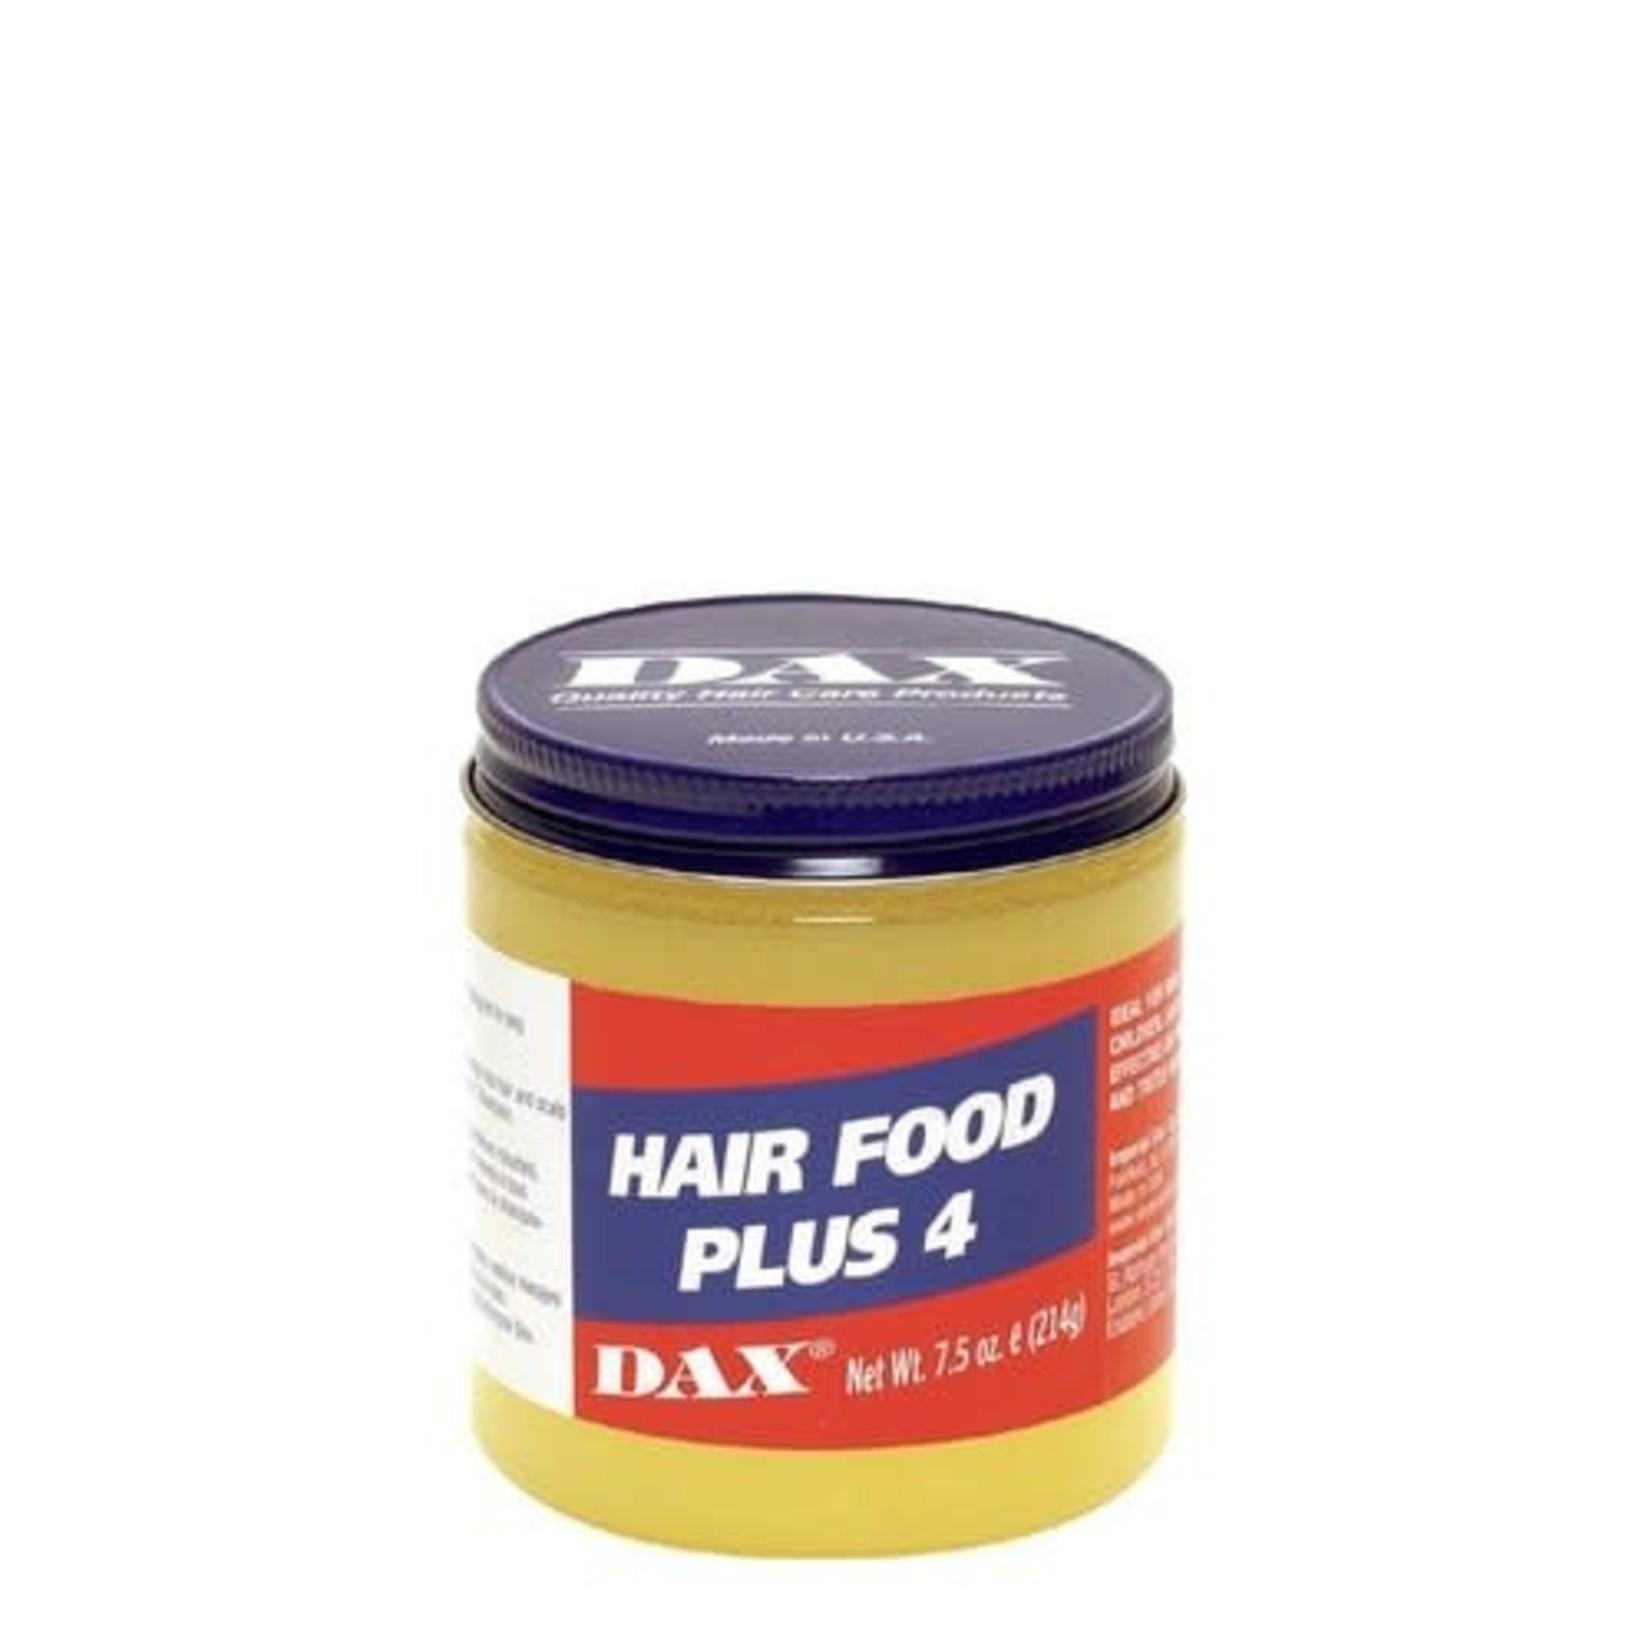 DAX DAX HAIR FOOD PLUS 4 [7.5OZ]